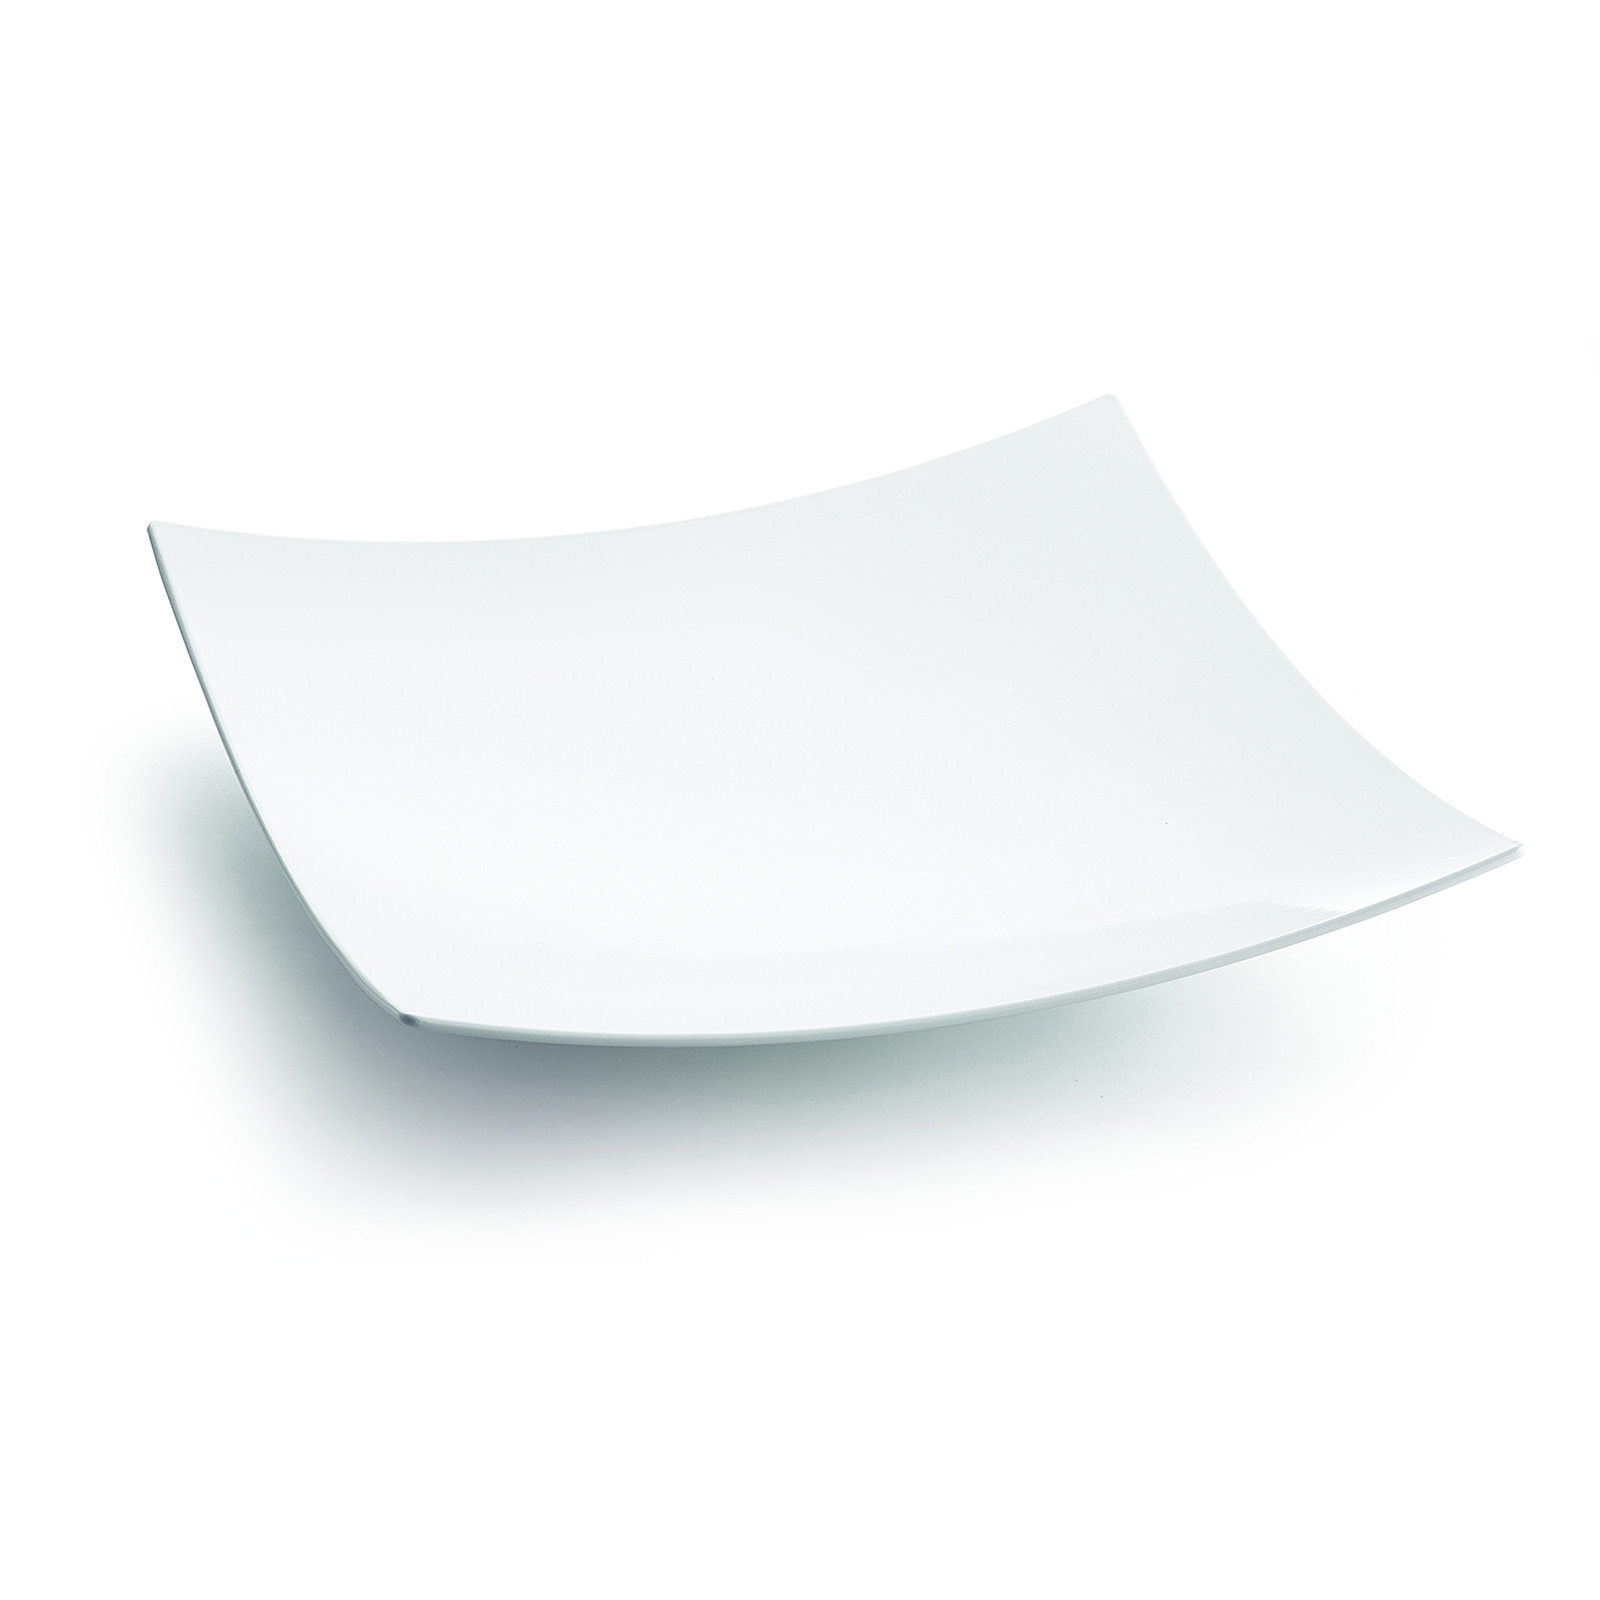 TableCraft Products M4070WH bowl, plastic,  5 - 6 qt (160 - 223 oz)